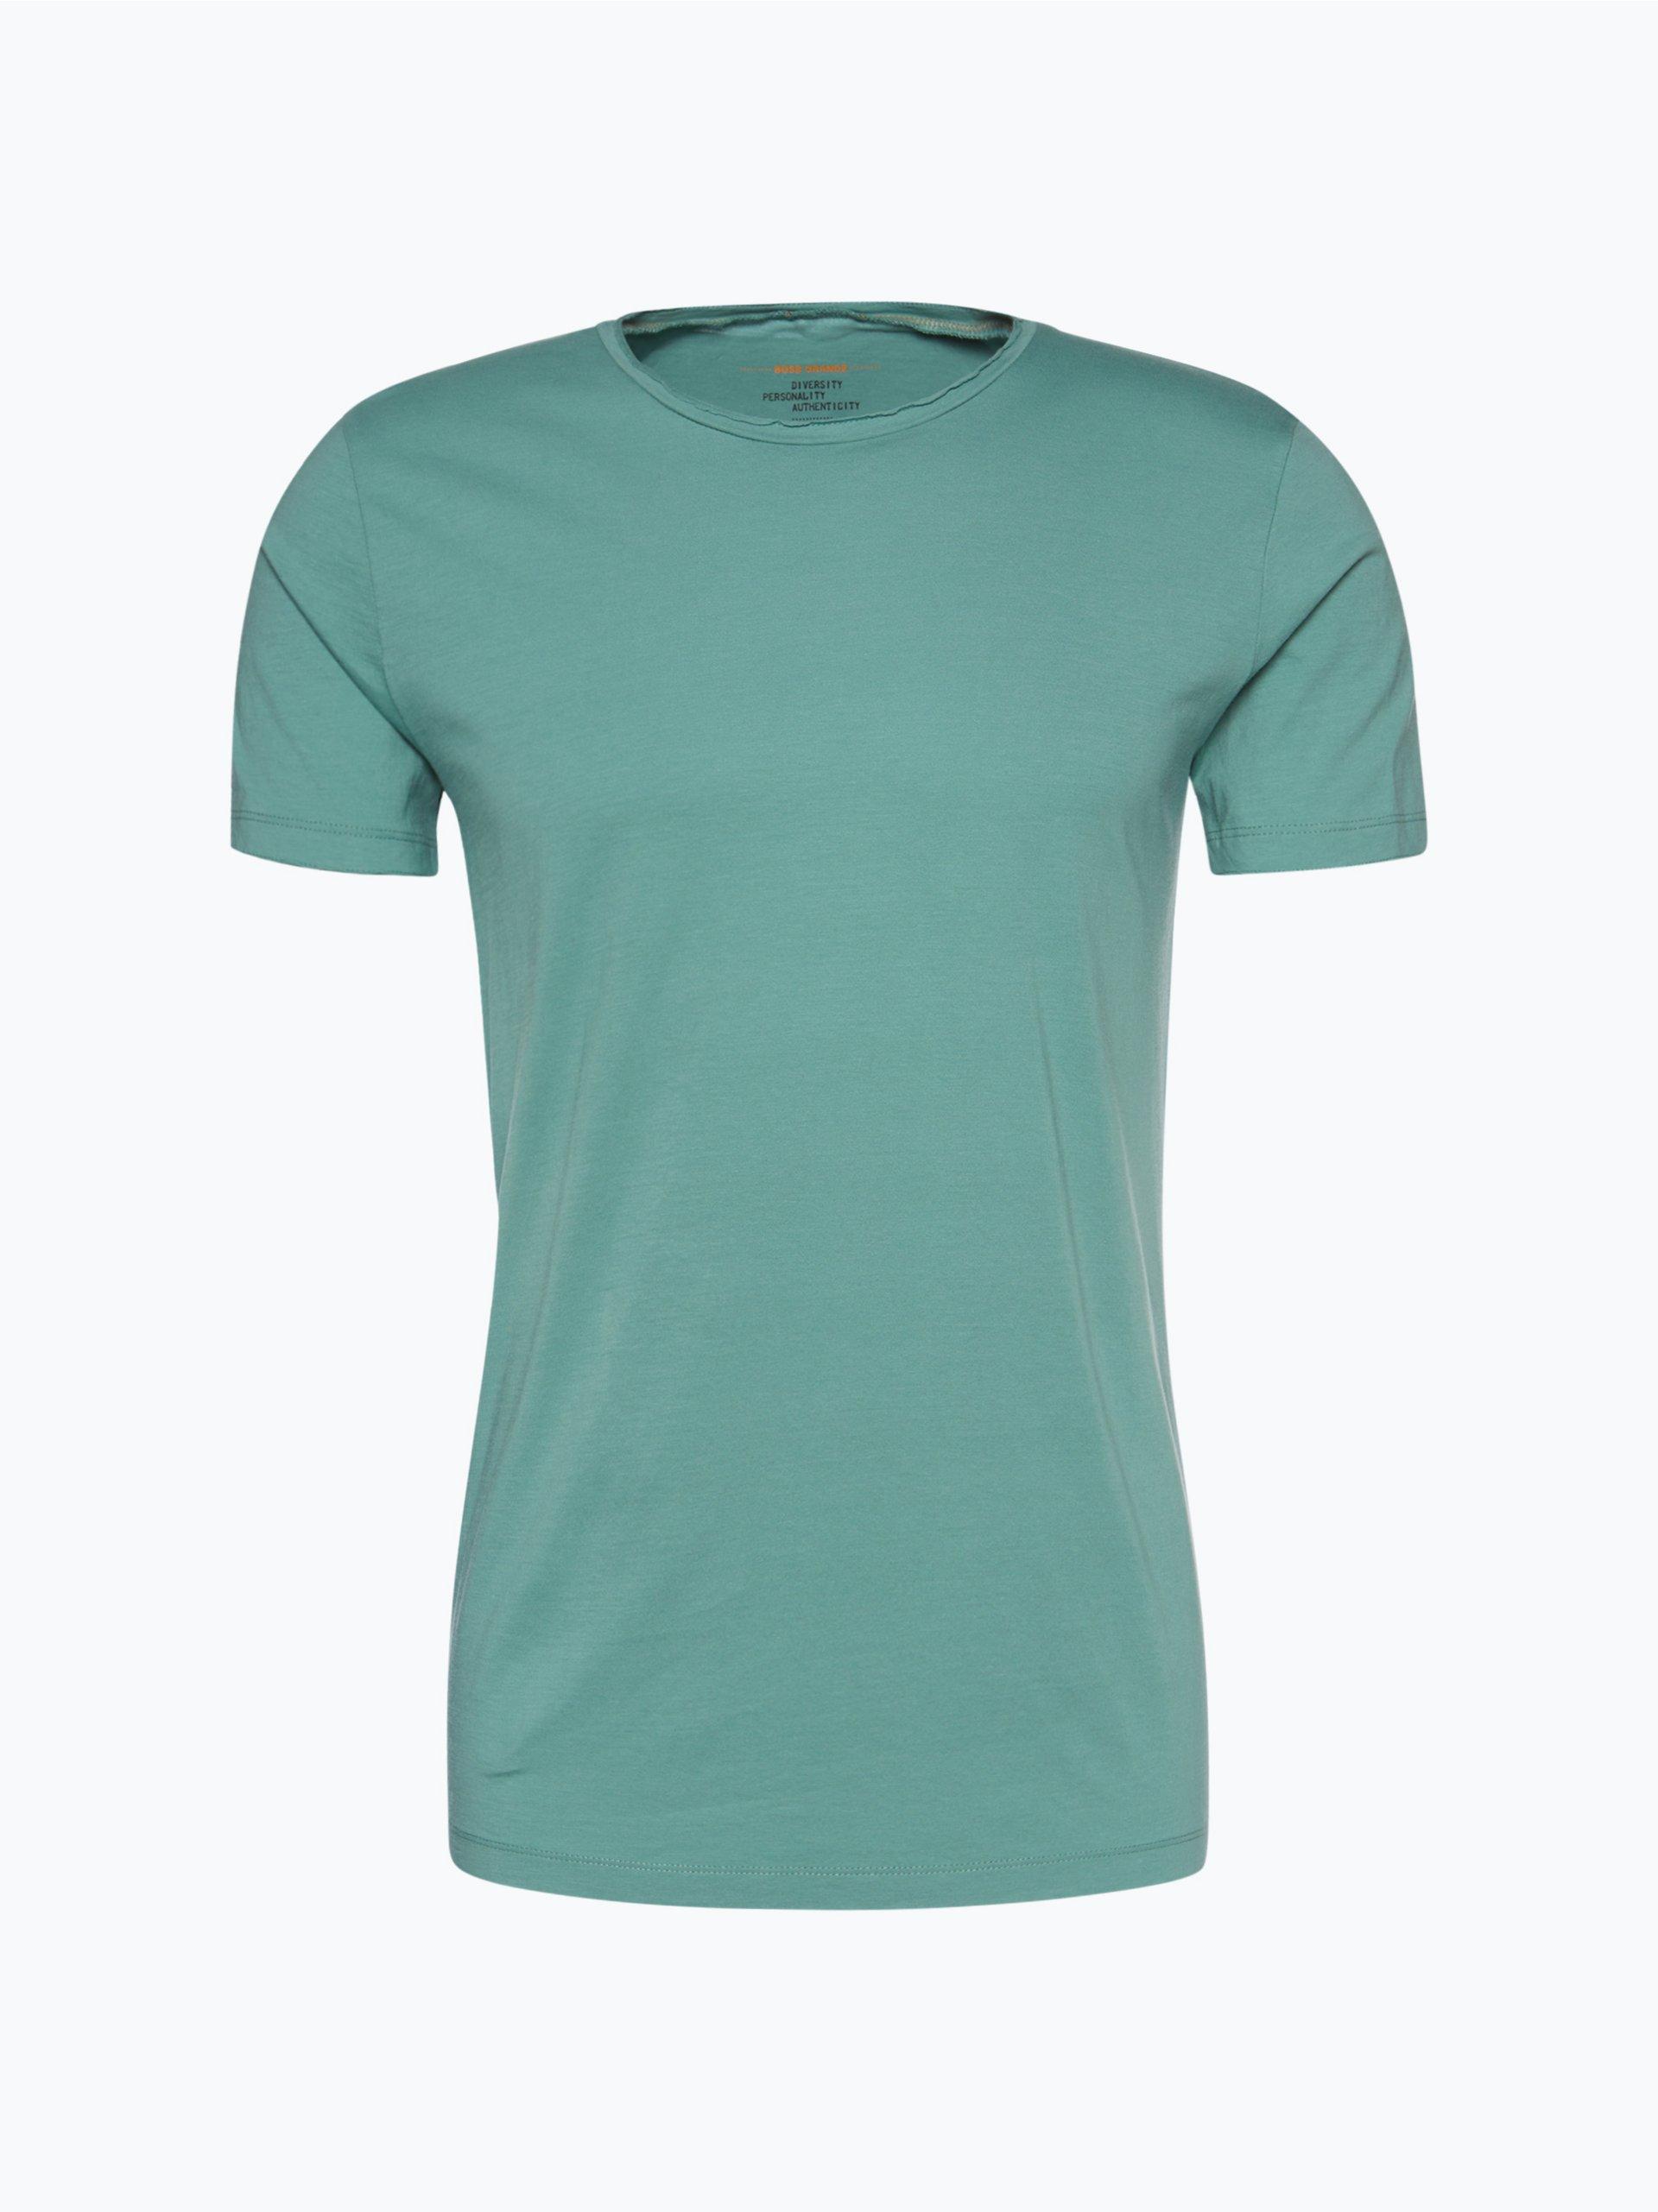 BOSS Casual Herren T-Shirt - Tooles